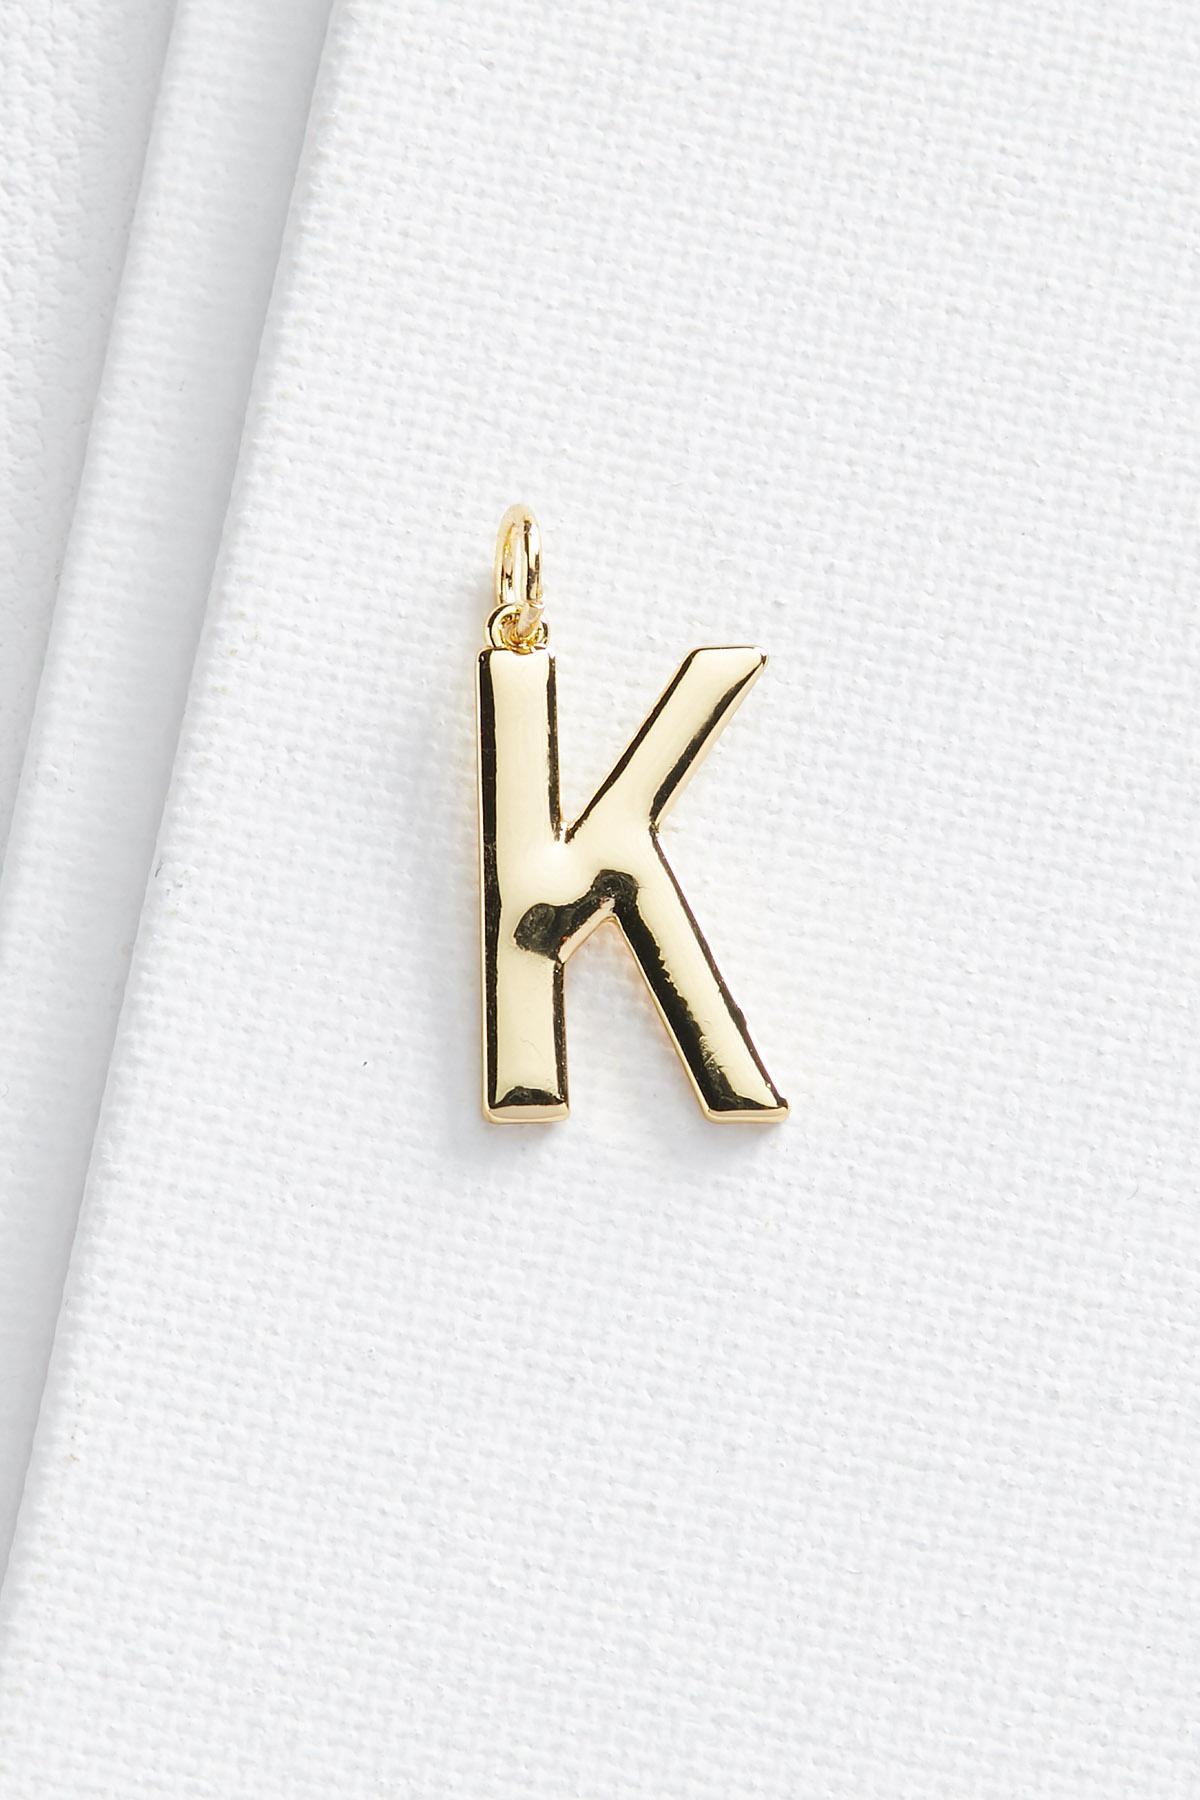 K Initial 19k Charm